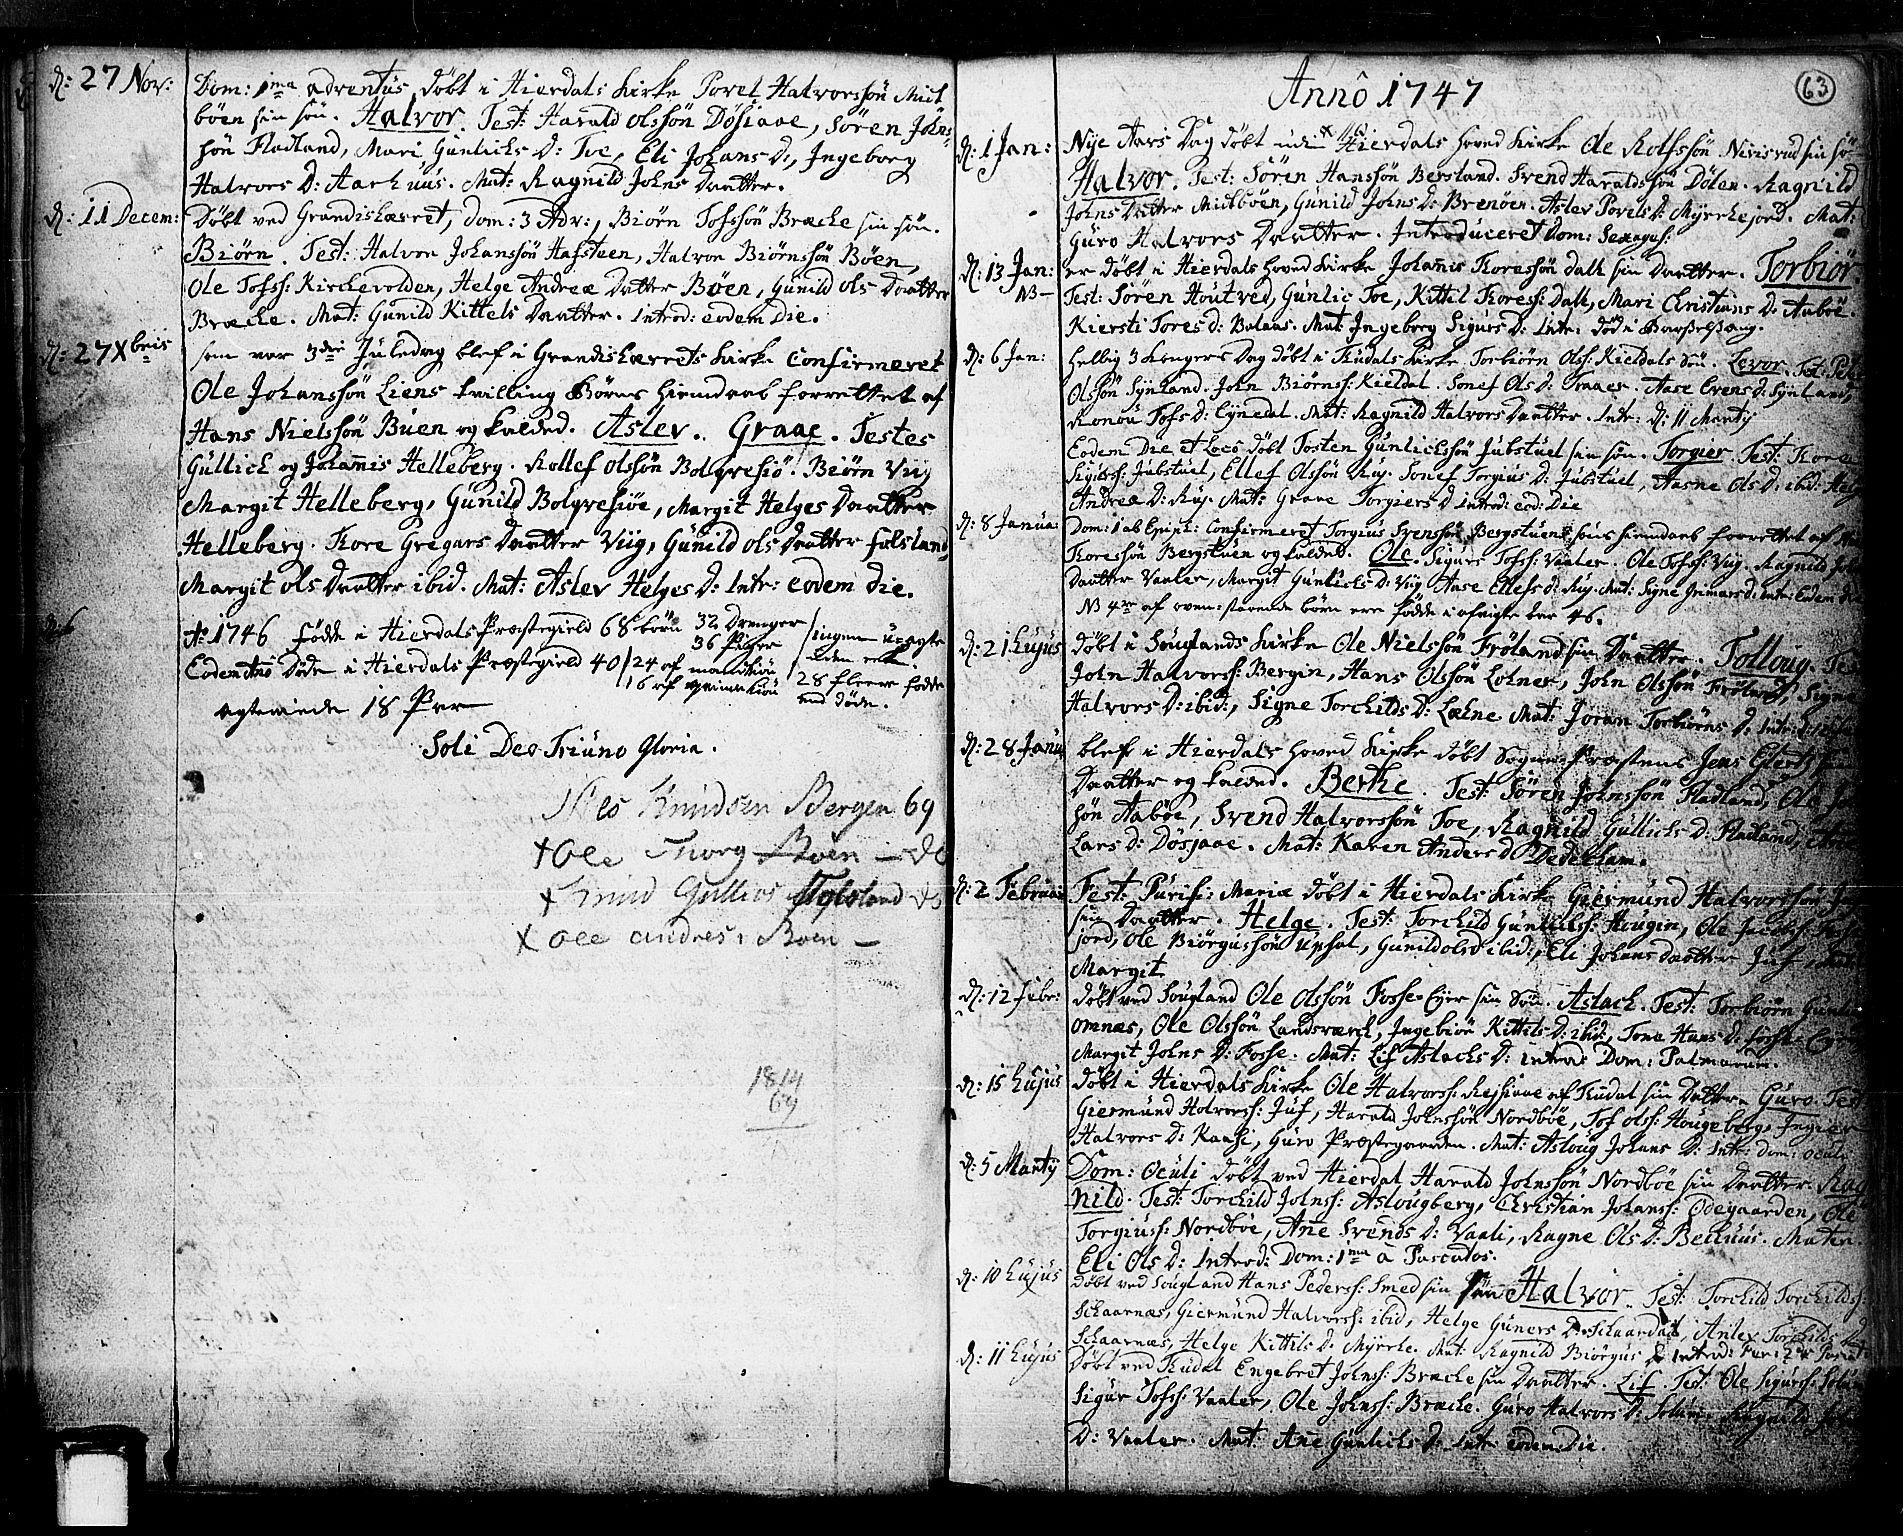 SAKO, Hjartdal kirkebøker, F/Fa/L0003: Ministerialbok nr. I 3, 1727-1775, s. 63